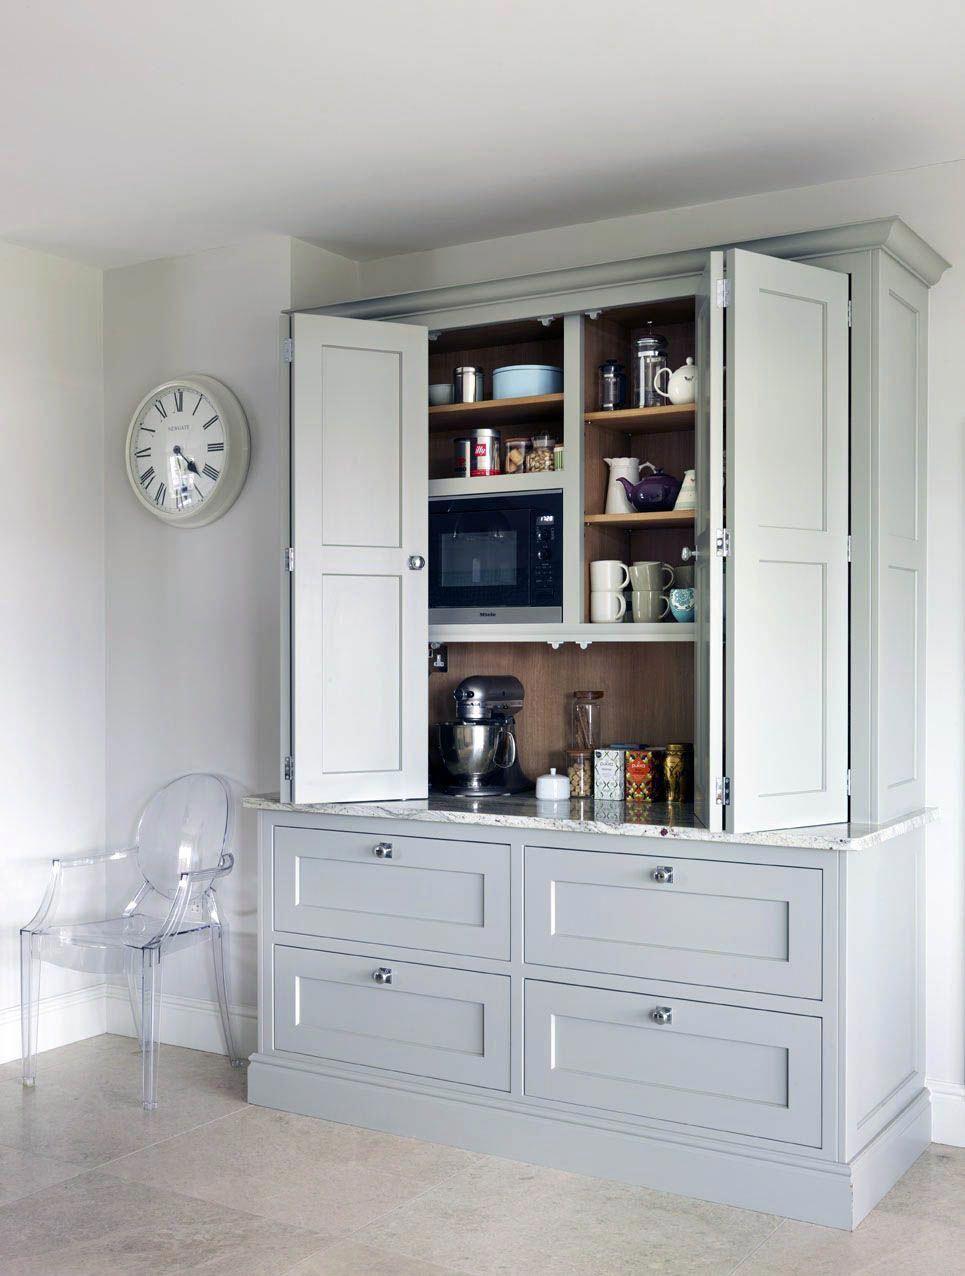 Examine here for 10x10 Kitchen remodel Kitchen appliance